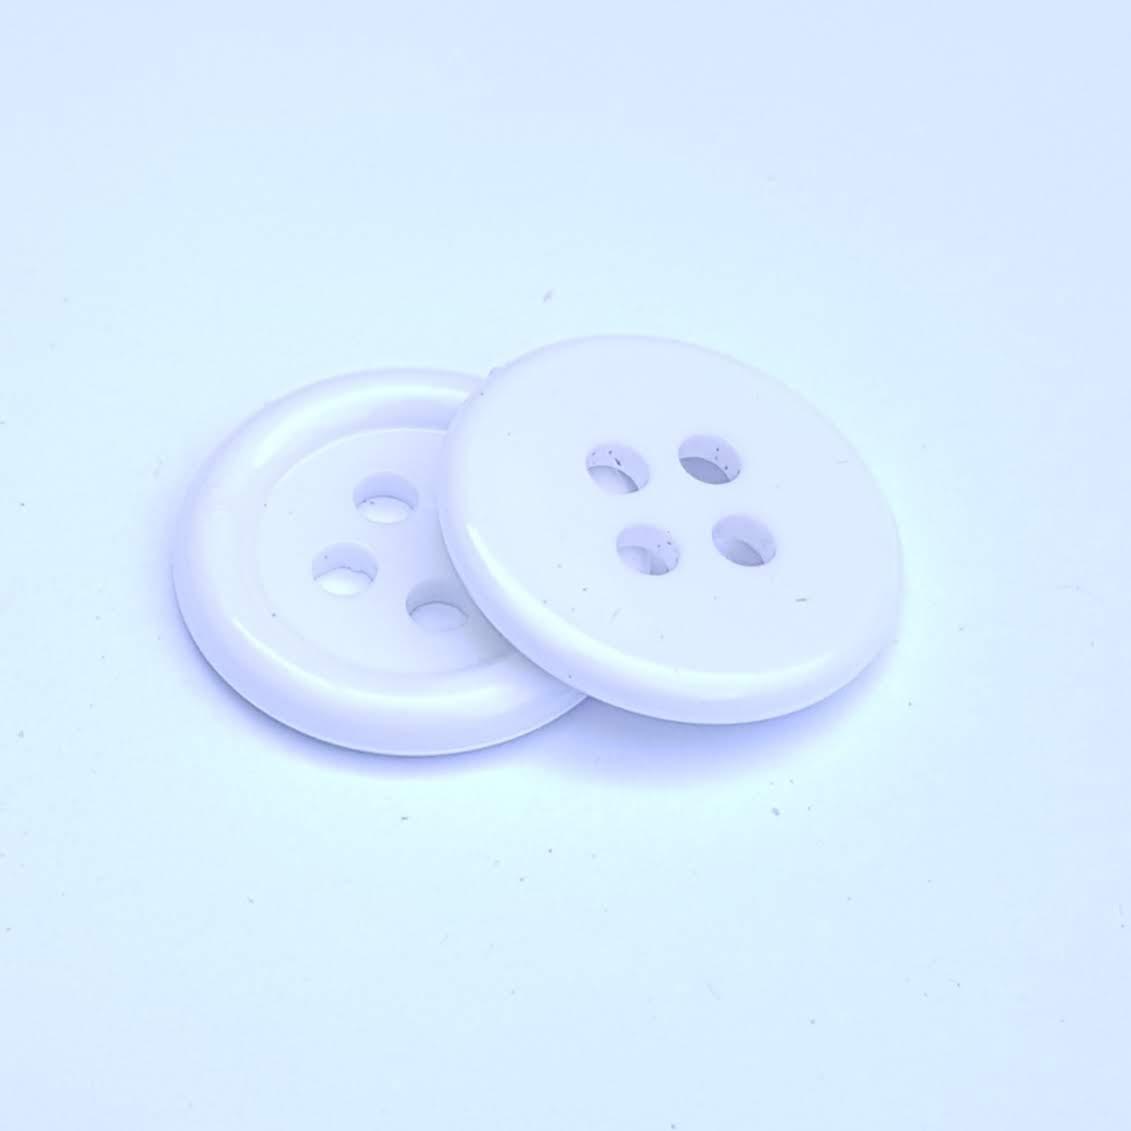 Botão de Casear Ritas 18mm Branco 10unid